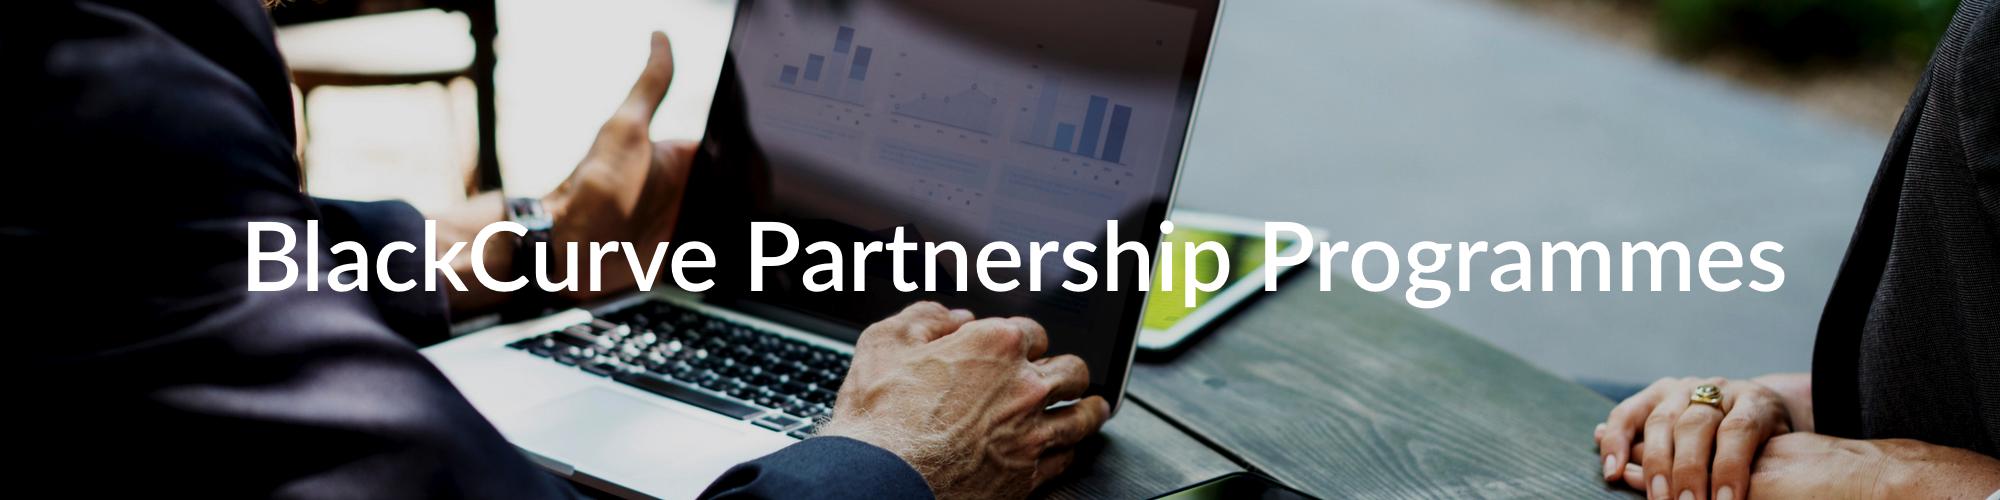 BlackCurve Partnership Programmes.png